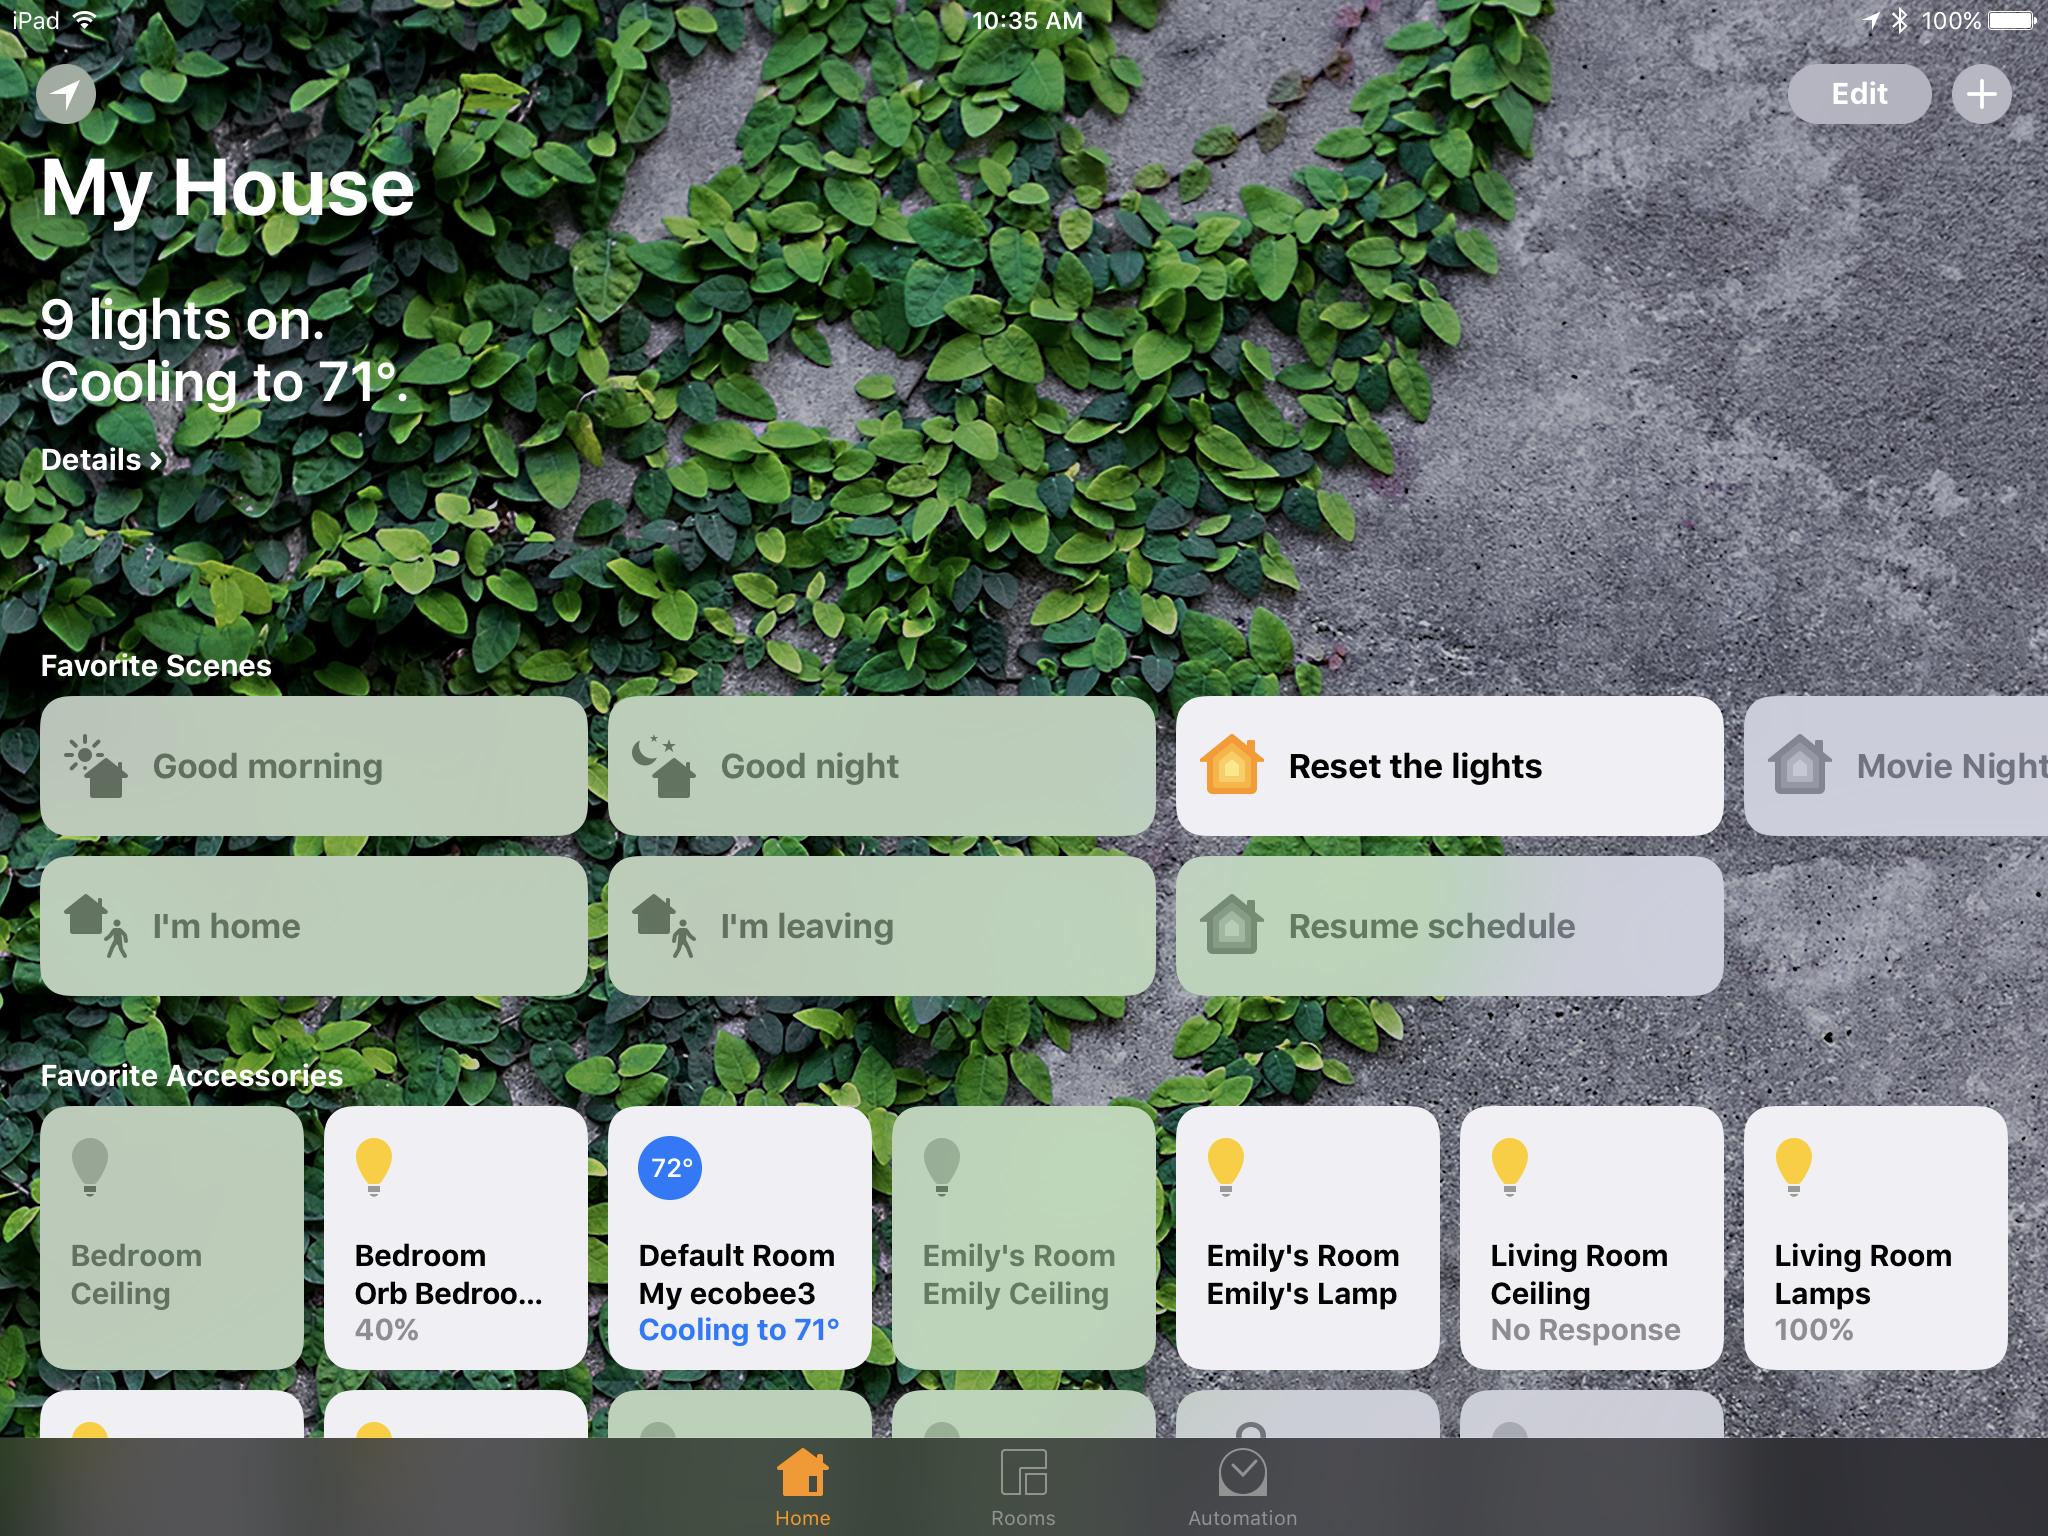 iOS 10 Home HomeKit app